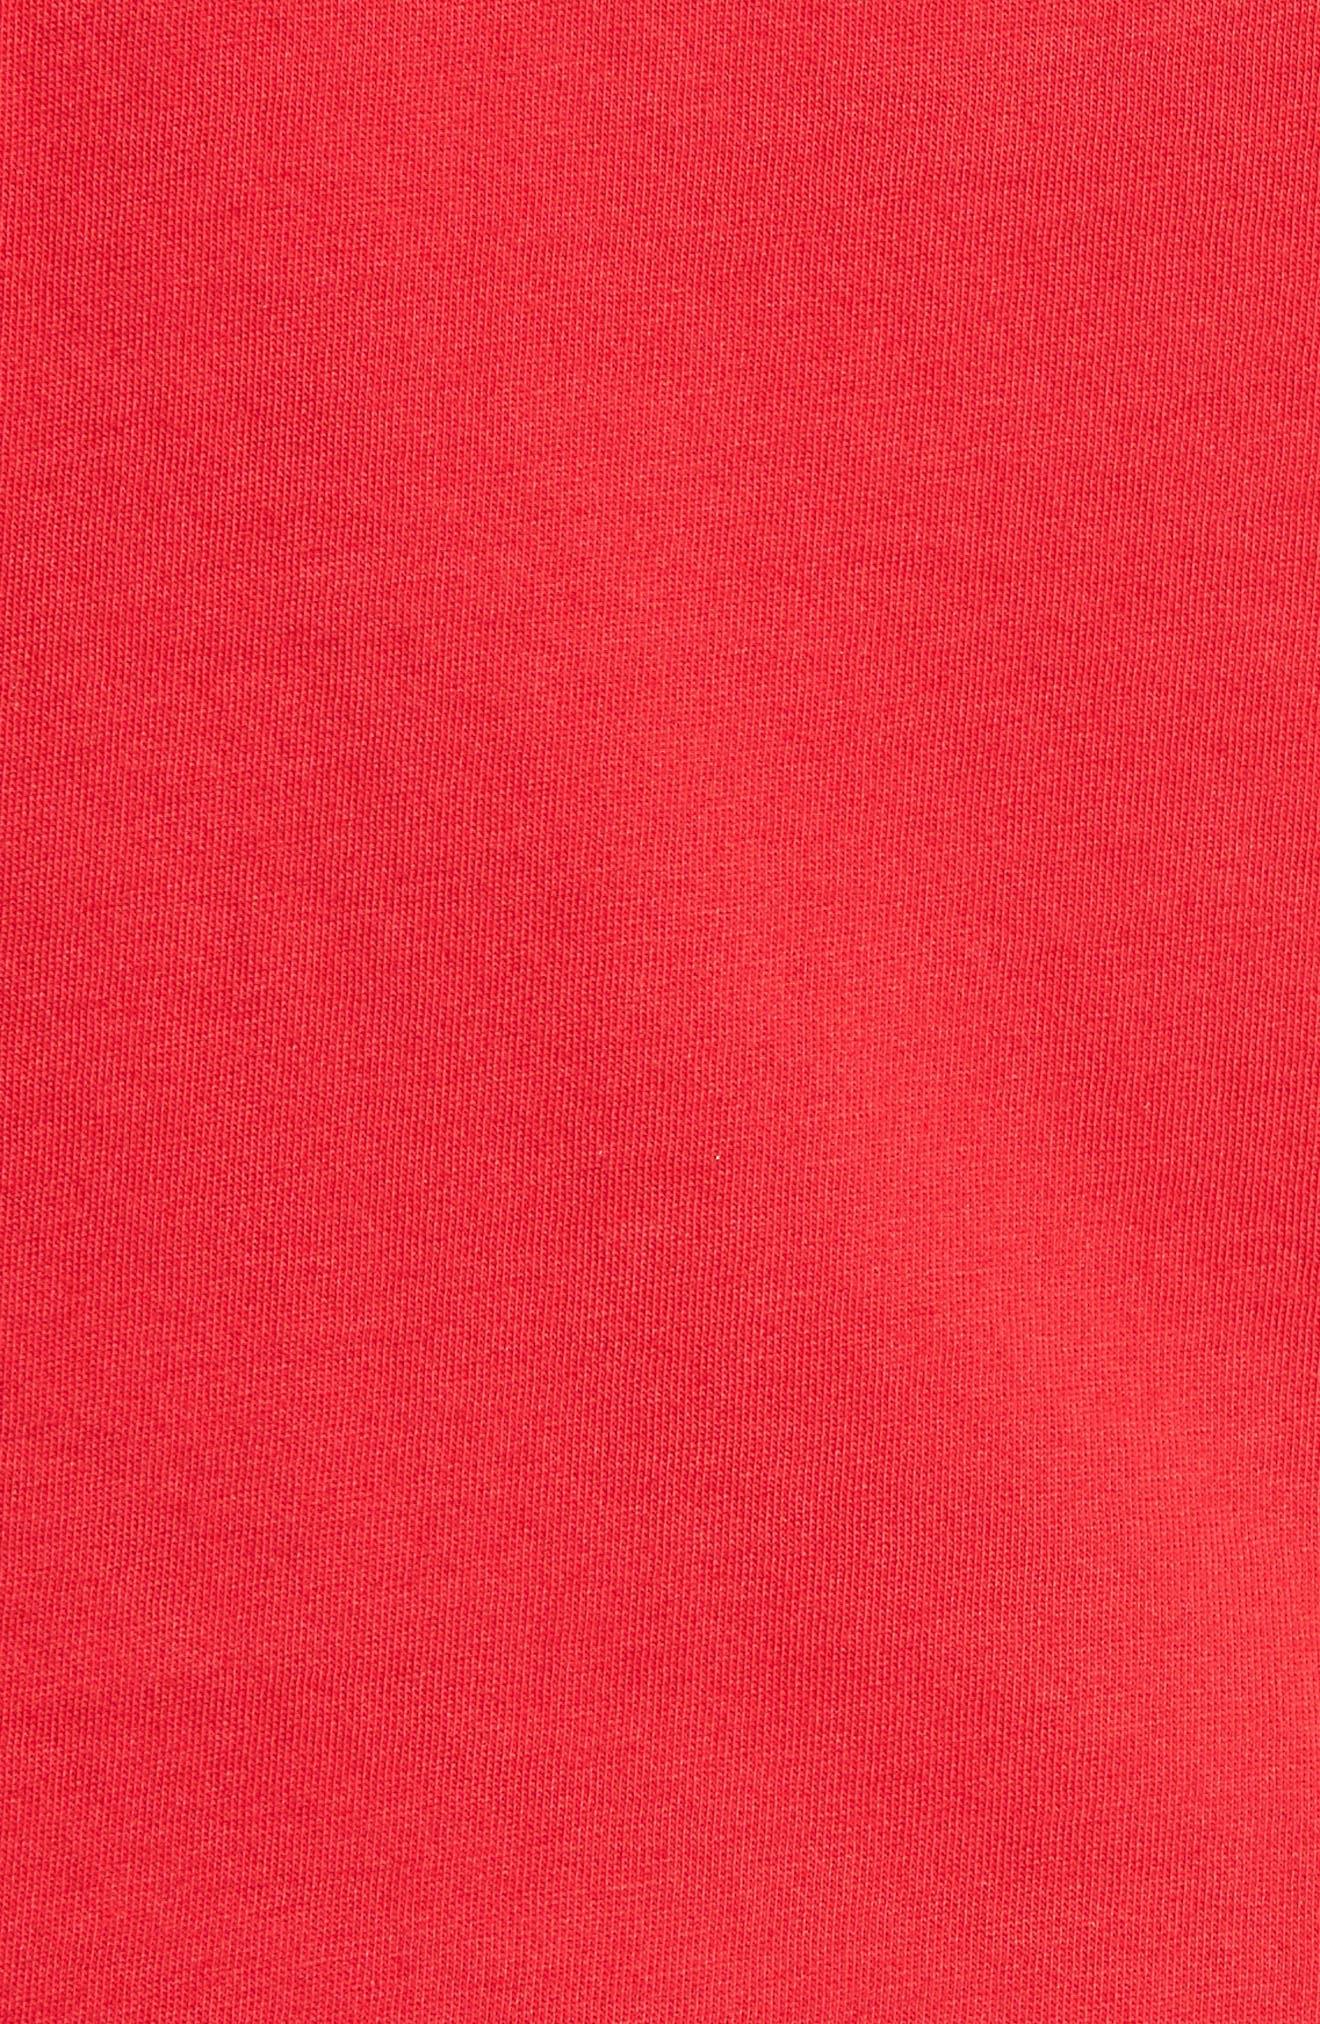 Short Sleeve Cotton Tee,                             Alternate thumbnail 60, color,